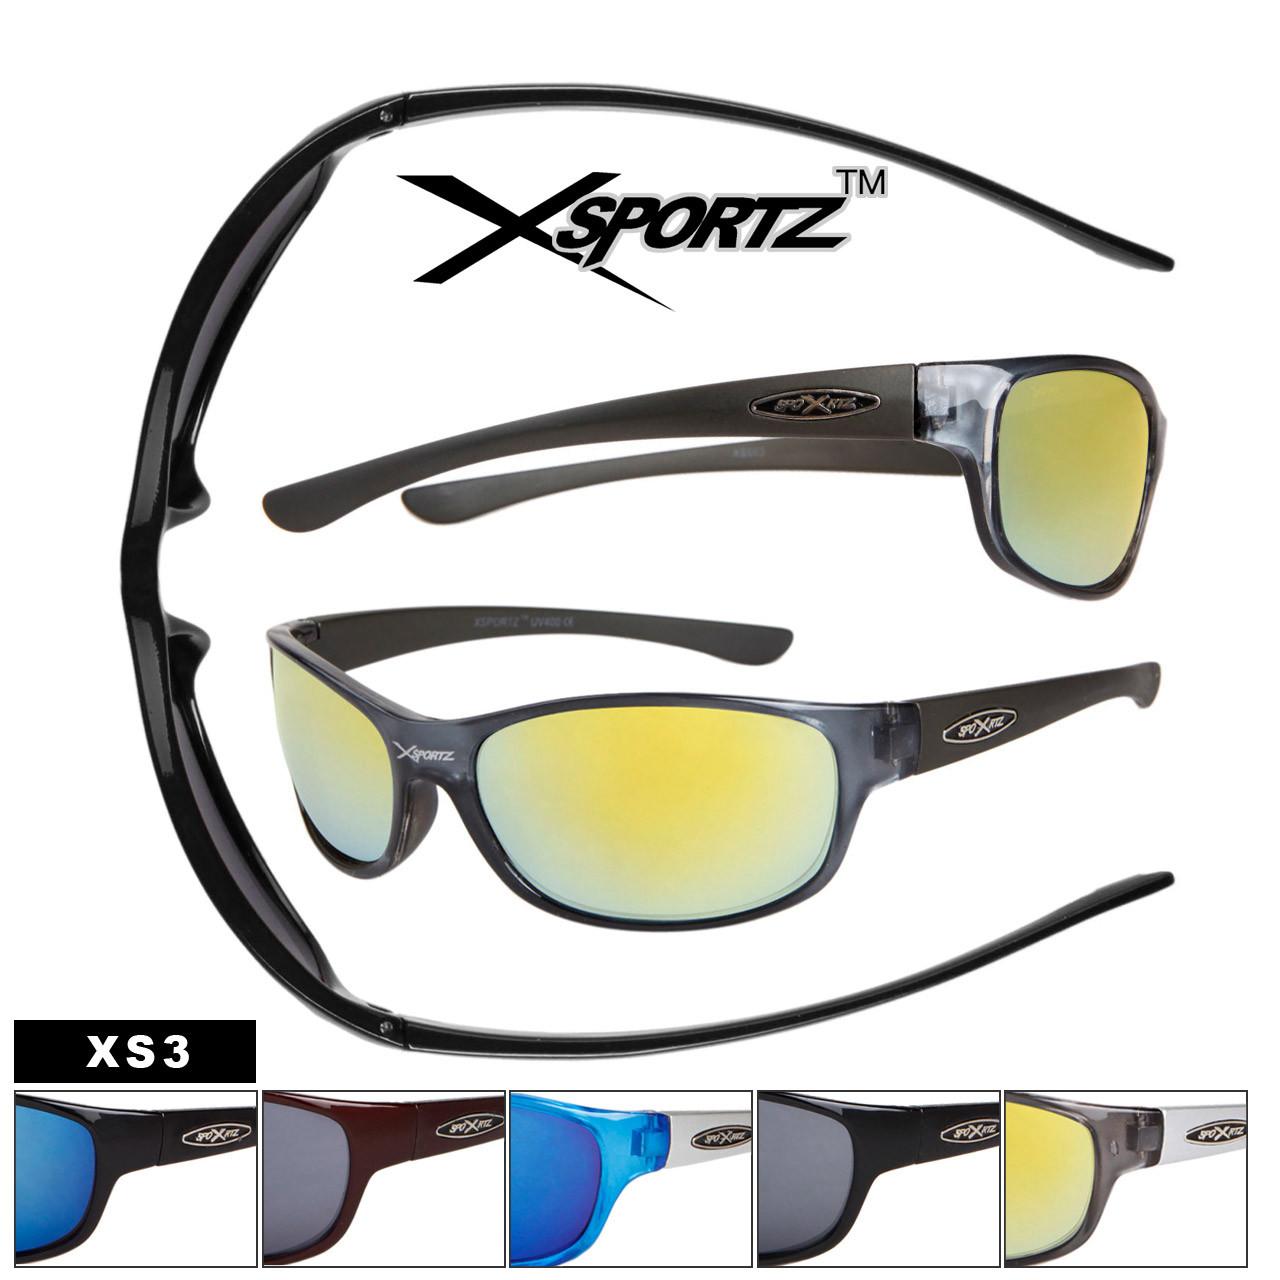 XS3 Sports Sunglasses Wholesale